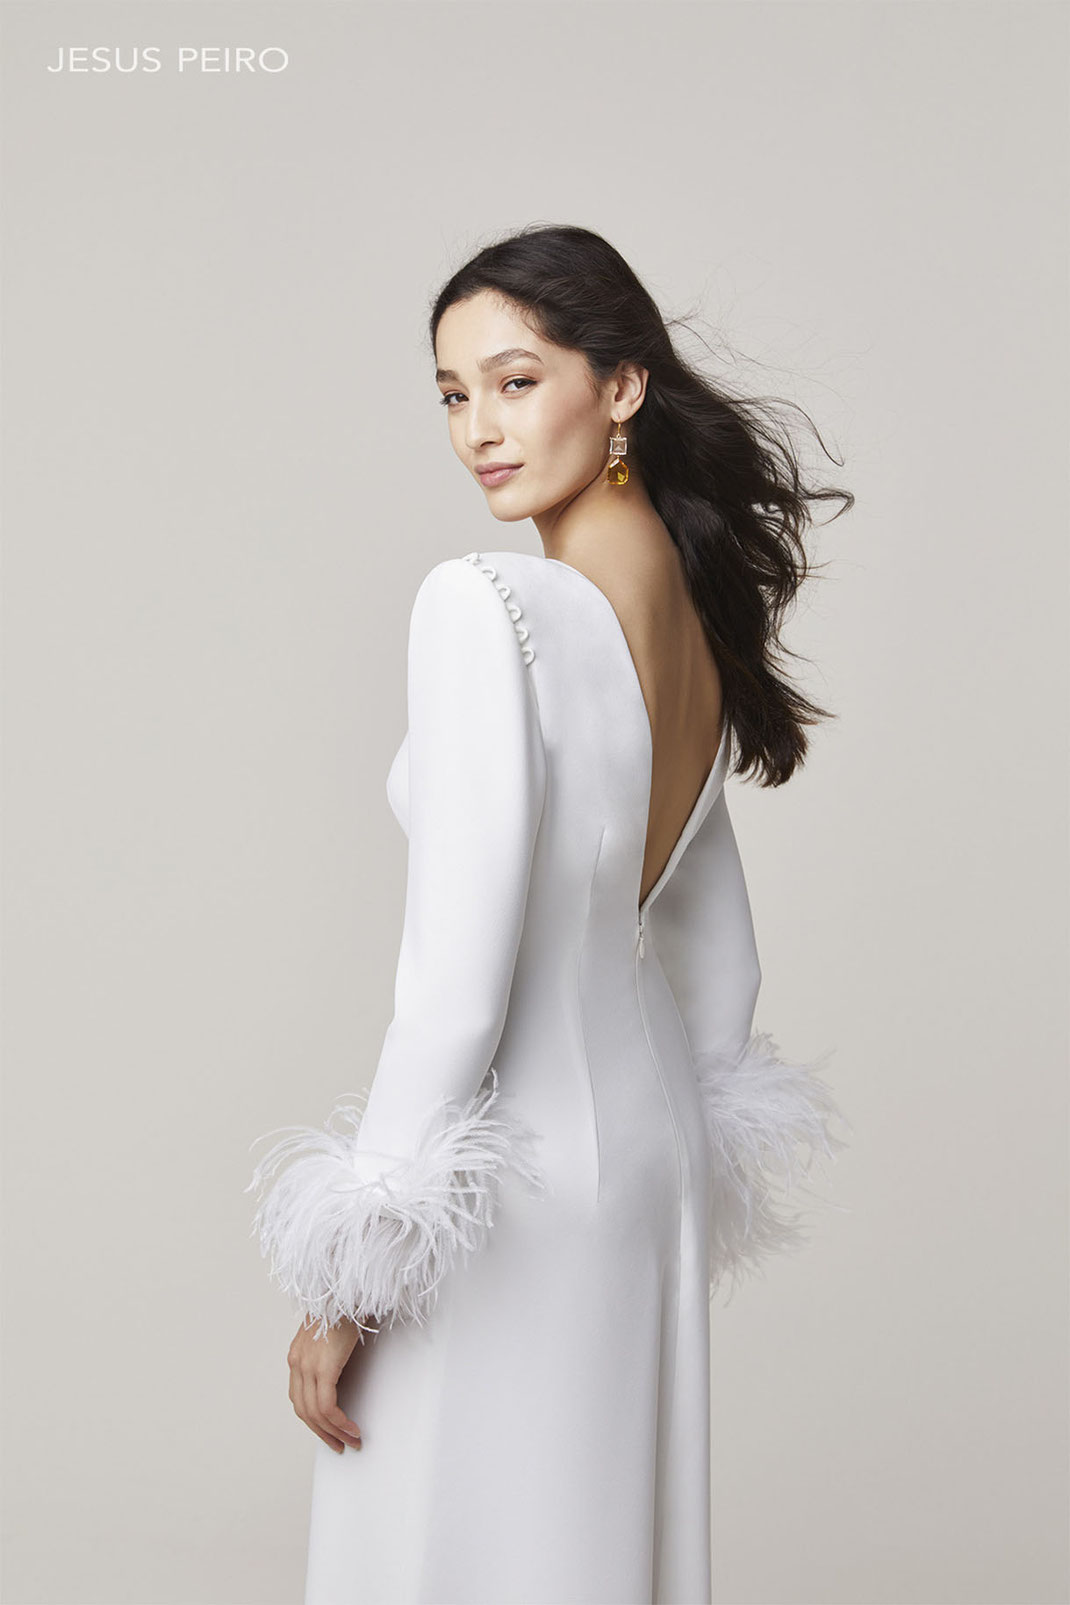 Brautkleid 2202 aus der Jesus Peiro Kollektion 2022